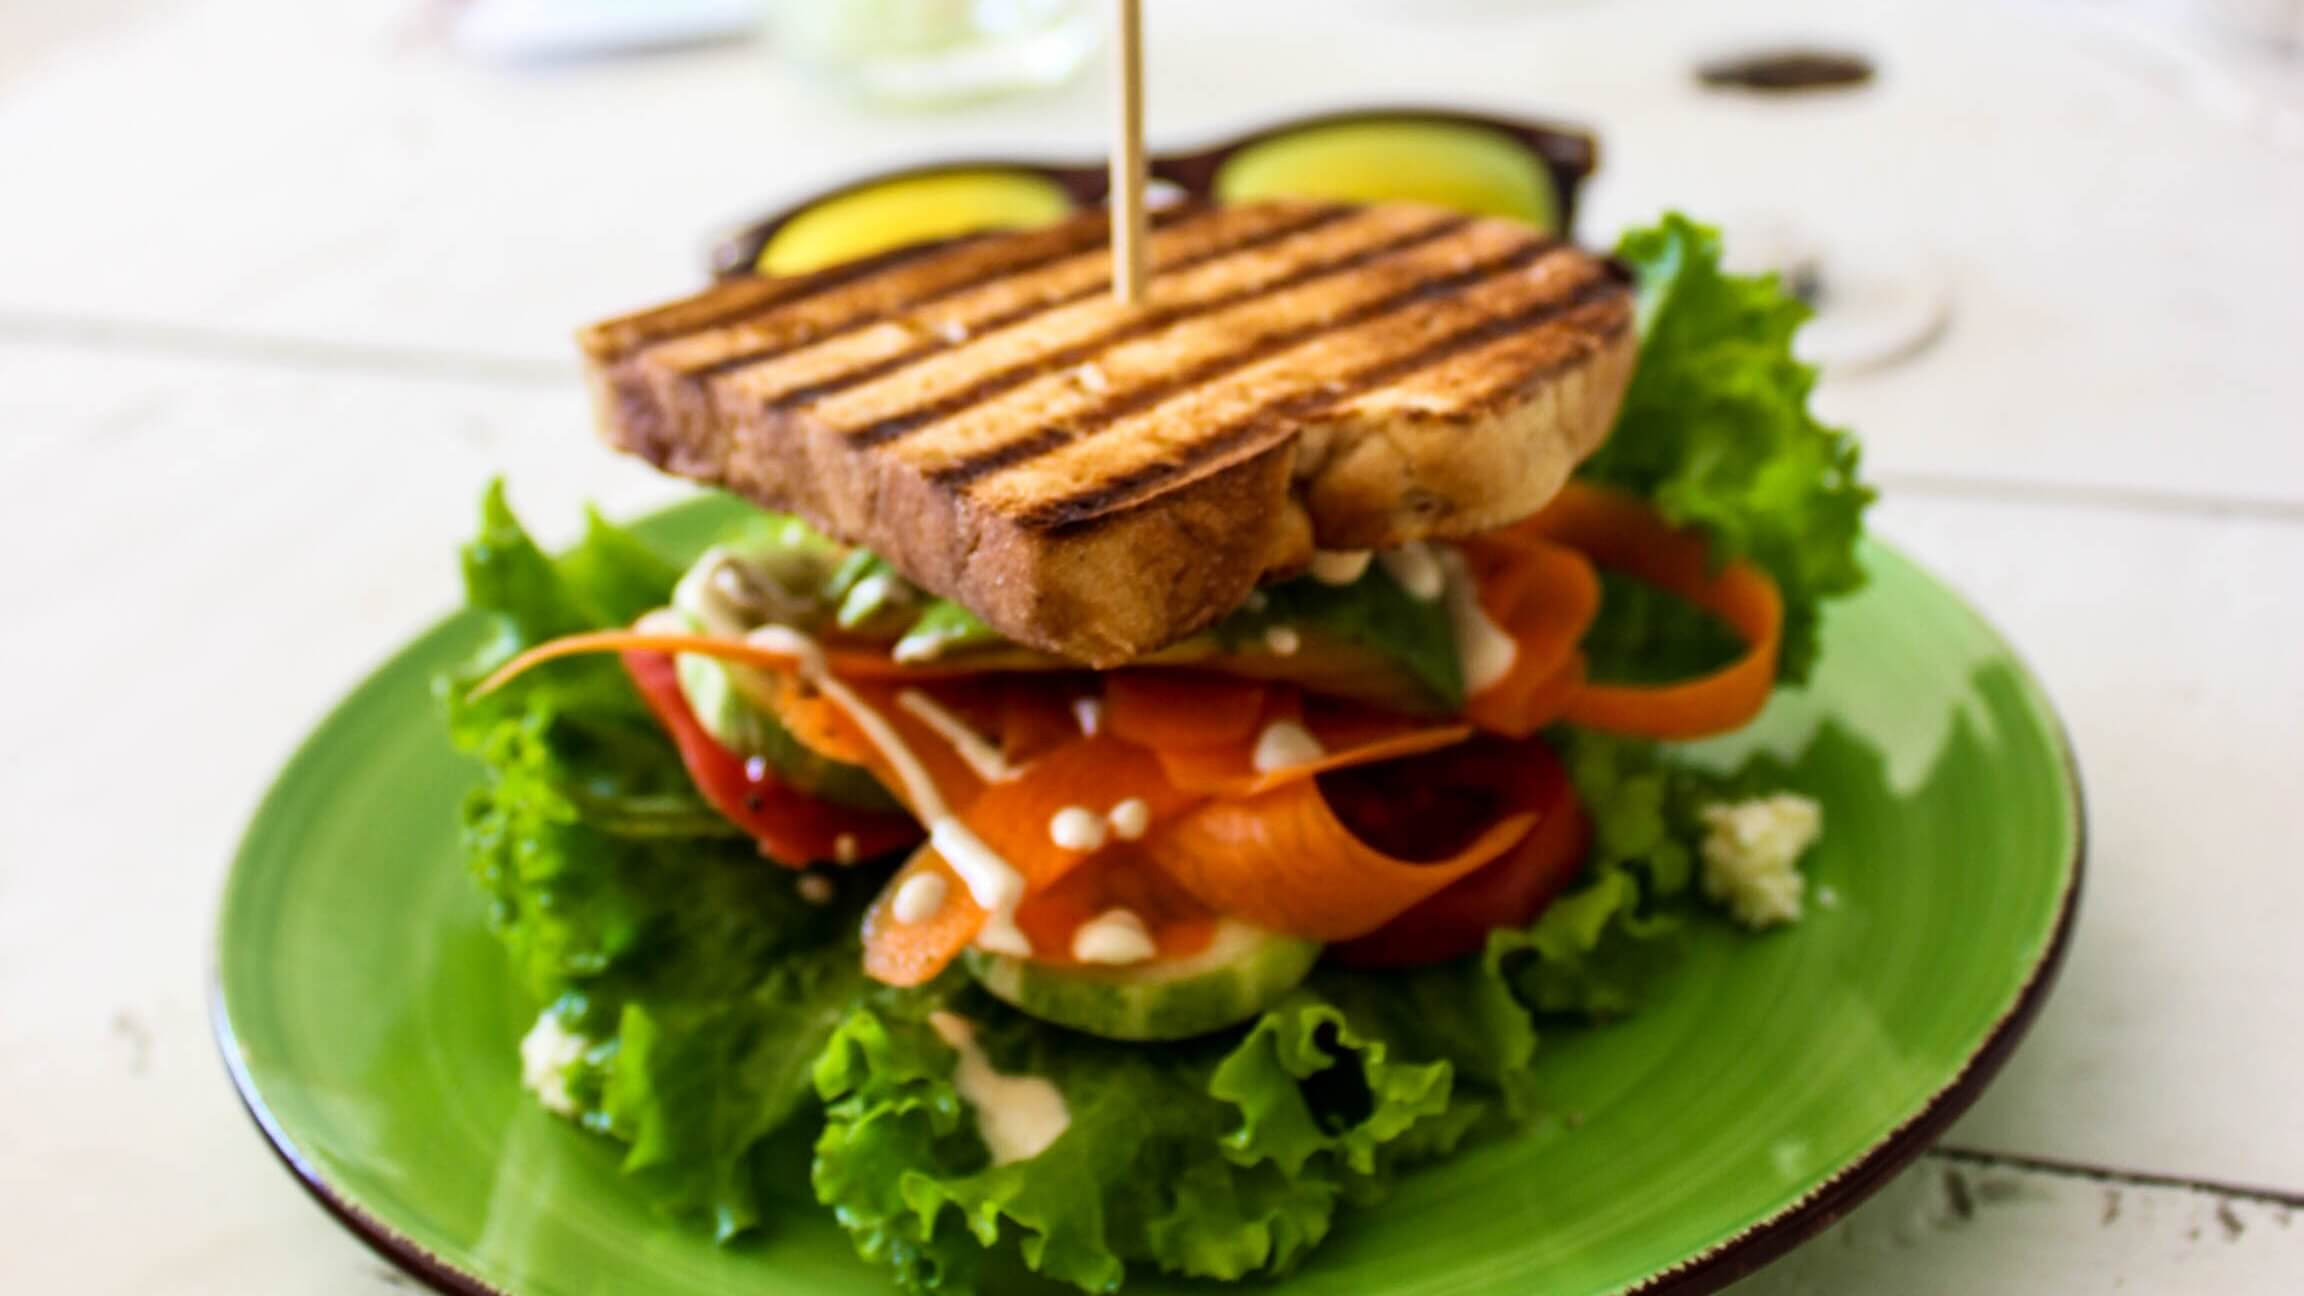 NoDa Bodega Deli Draws in North Carolina Meat-Eaters with Creative Vegan Night Menus